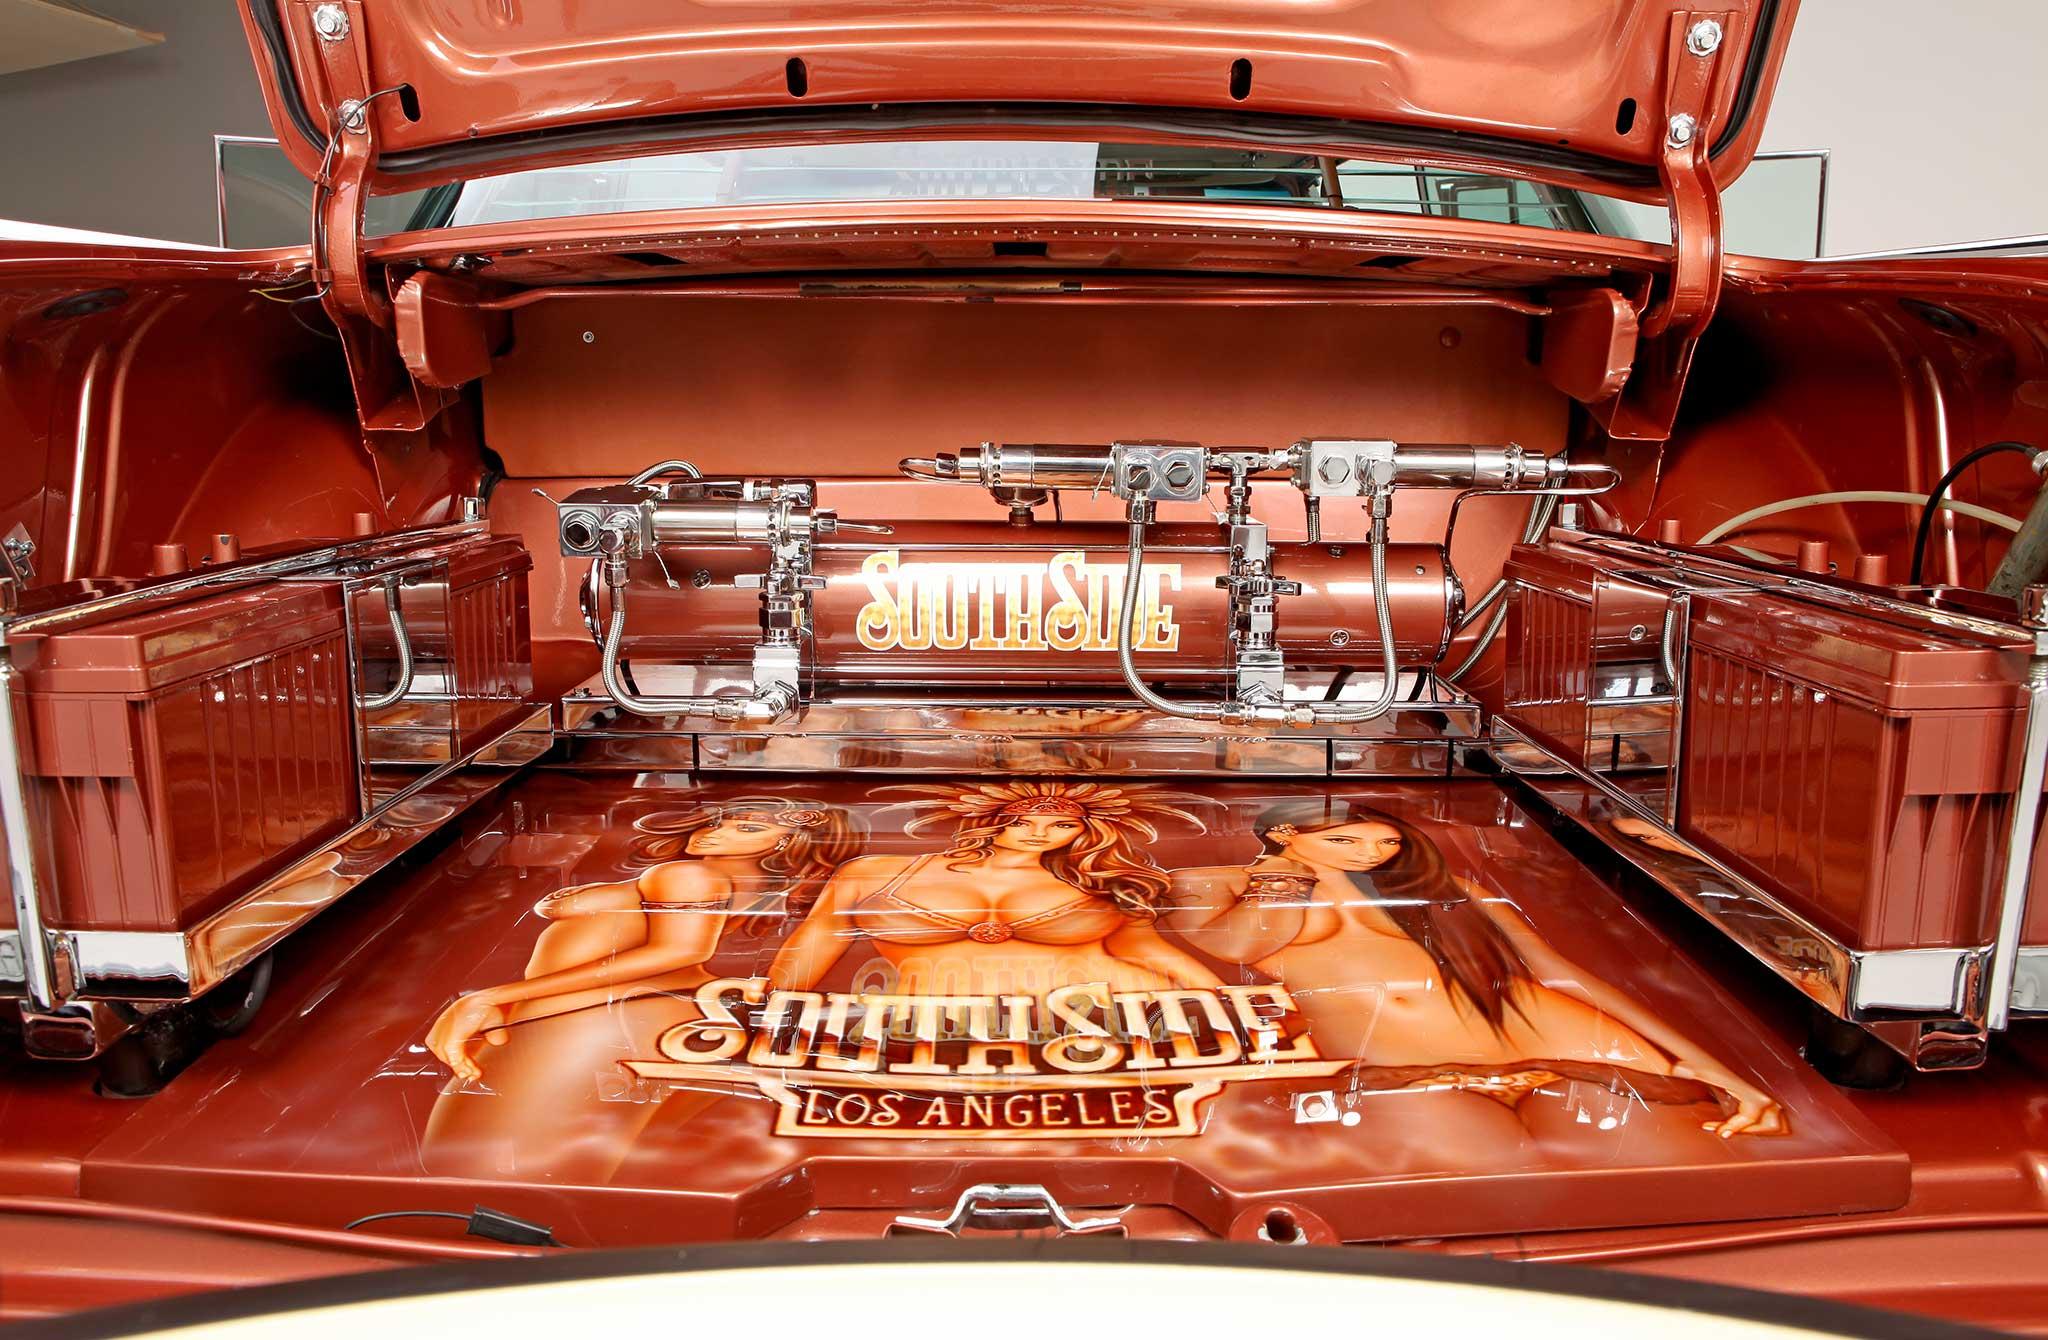 1957 Chevrolet Bel Air The Fresh King Of Bel Air